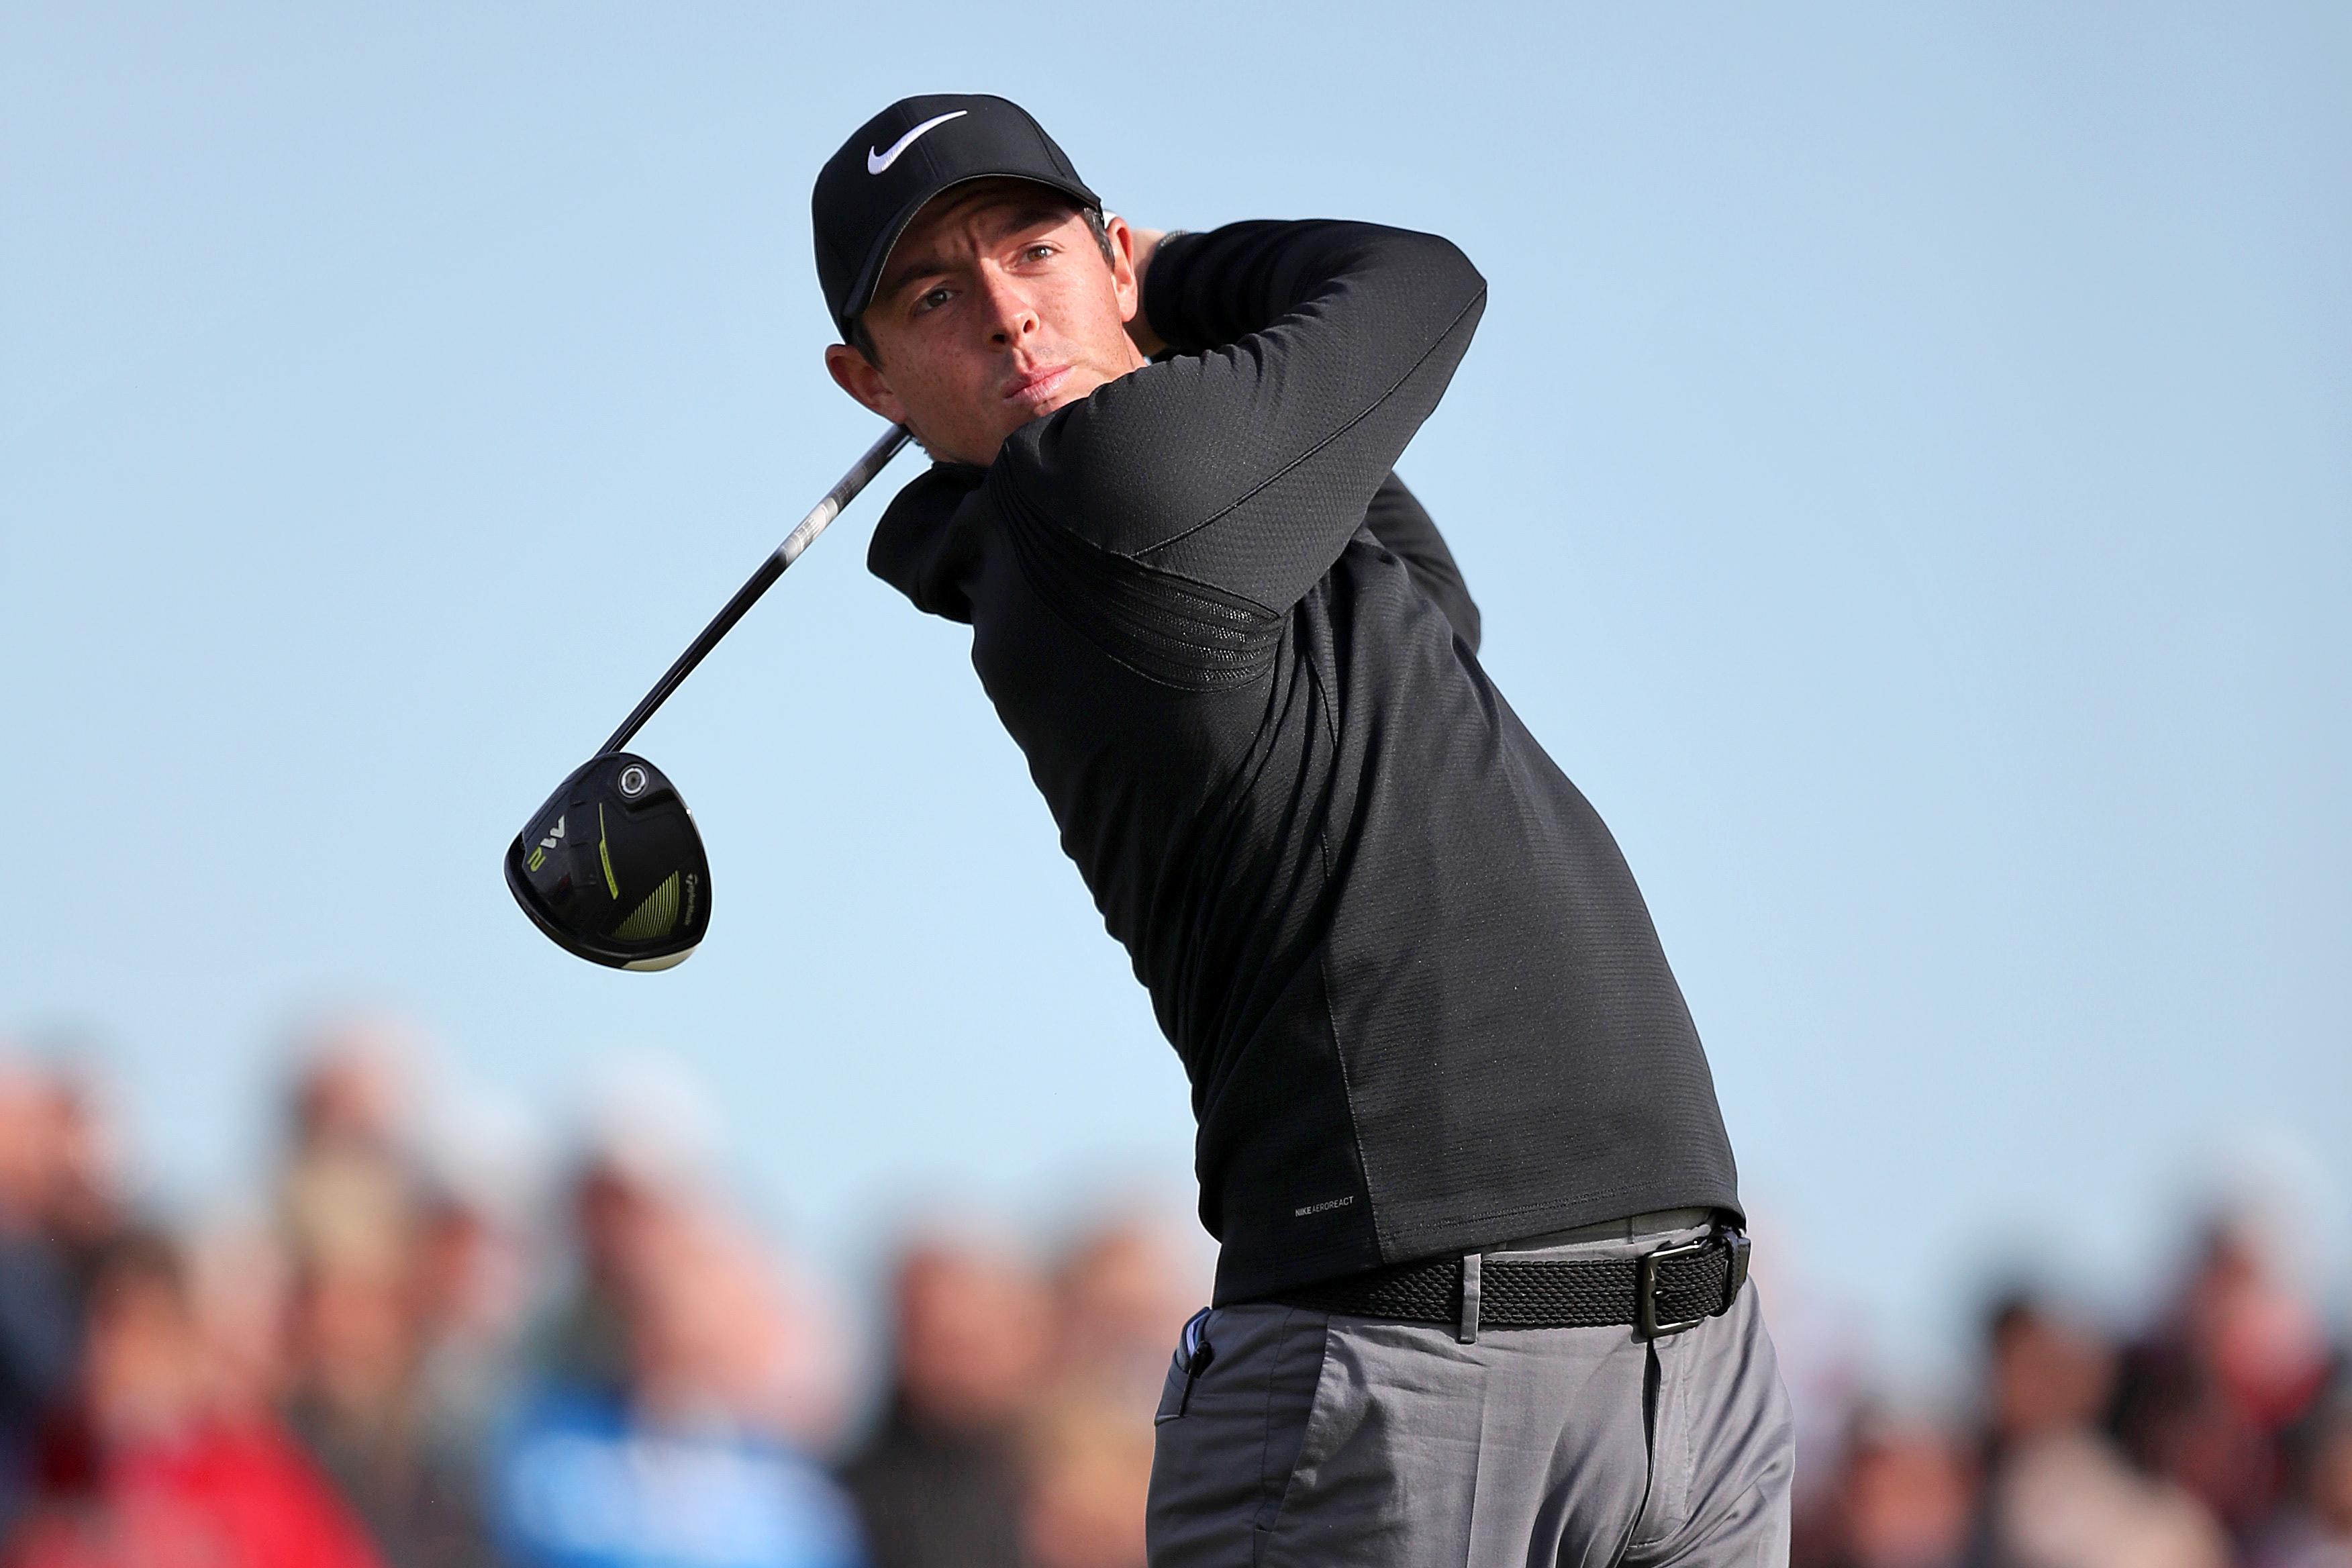 Rory McIlroy golfing